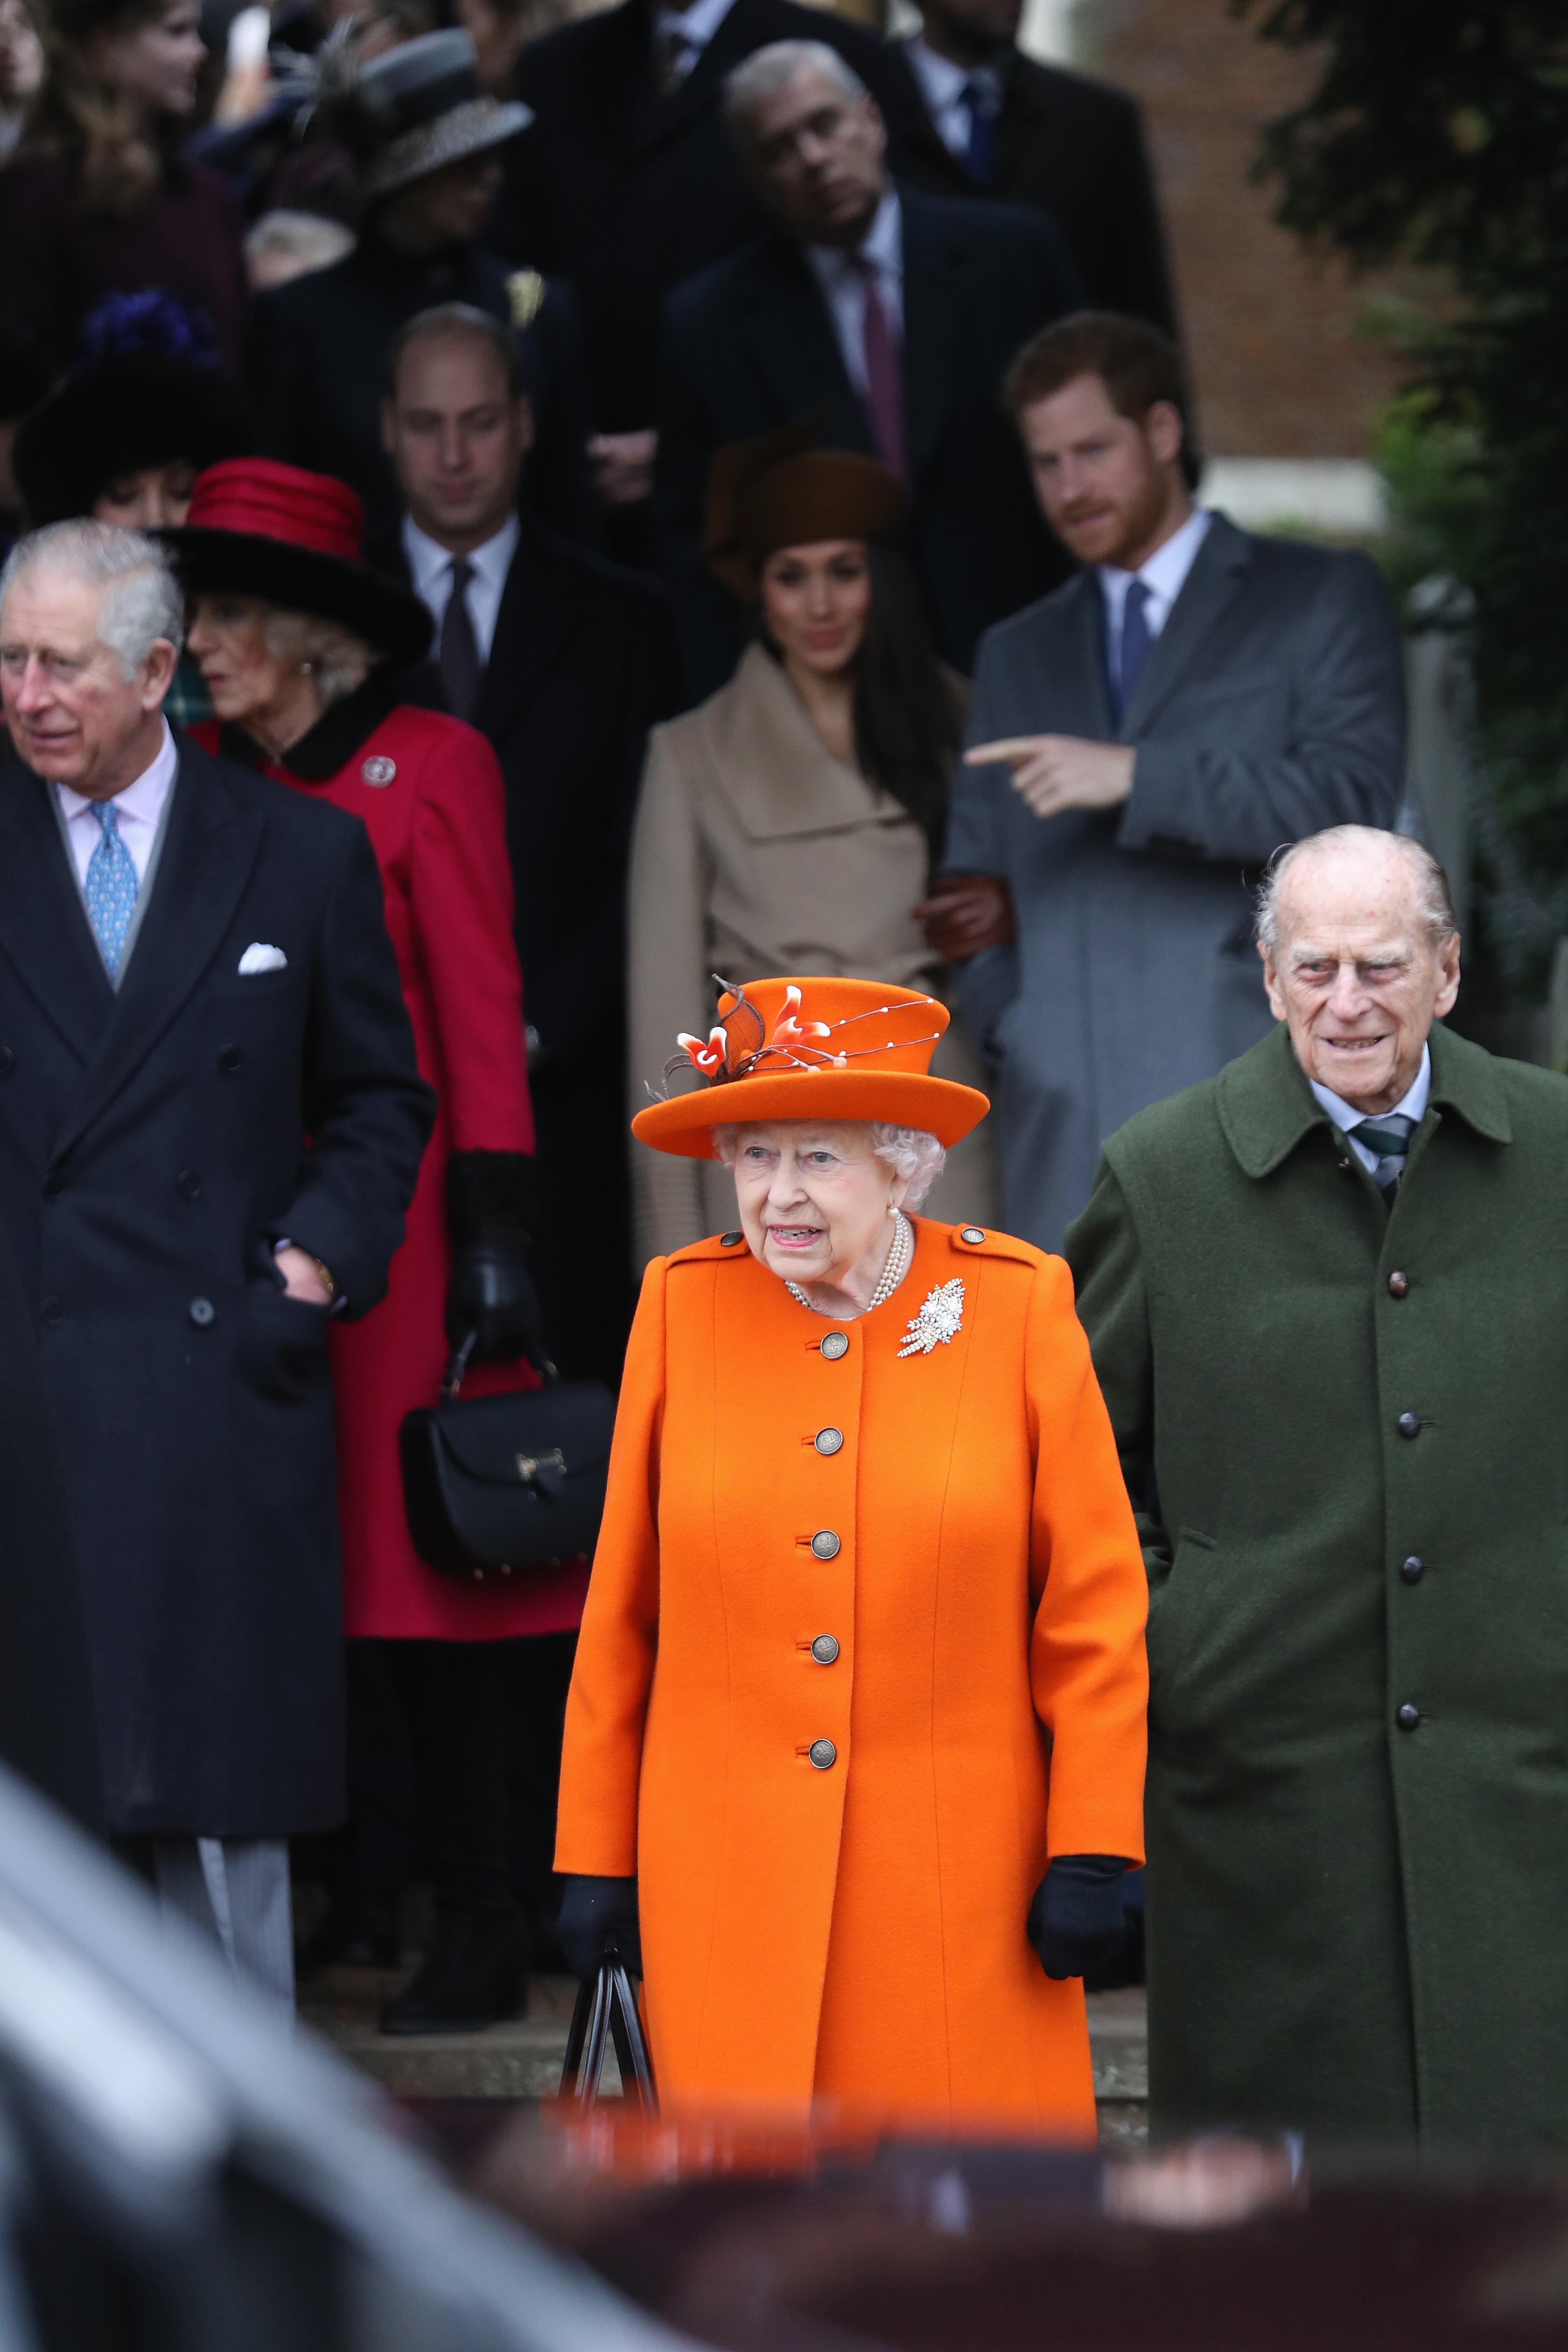 rince Charles, Prince of Wales, Camilla, Duchess of Cornwall, Queen Elizabeth II, Prince Philip, Duke of Edinburgh, Meghan Markle Prince Harry